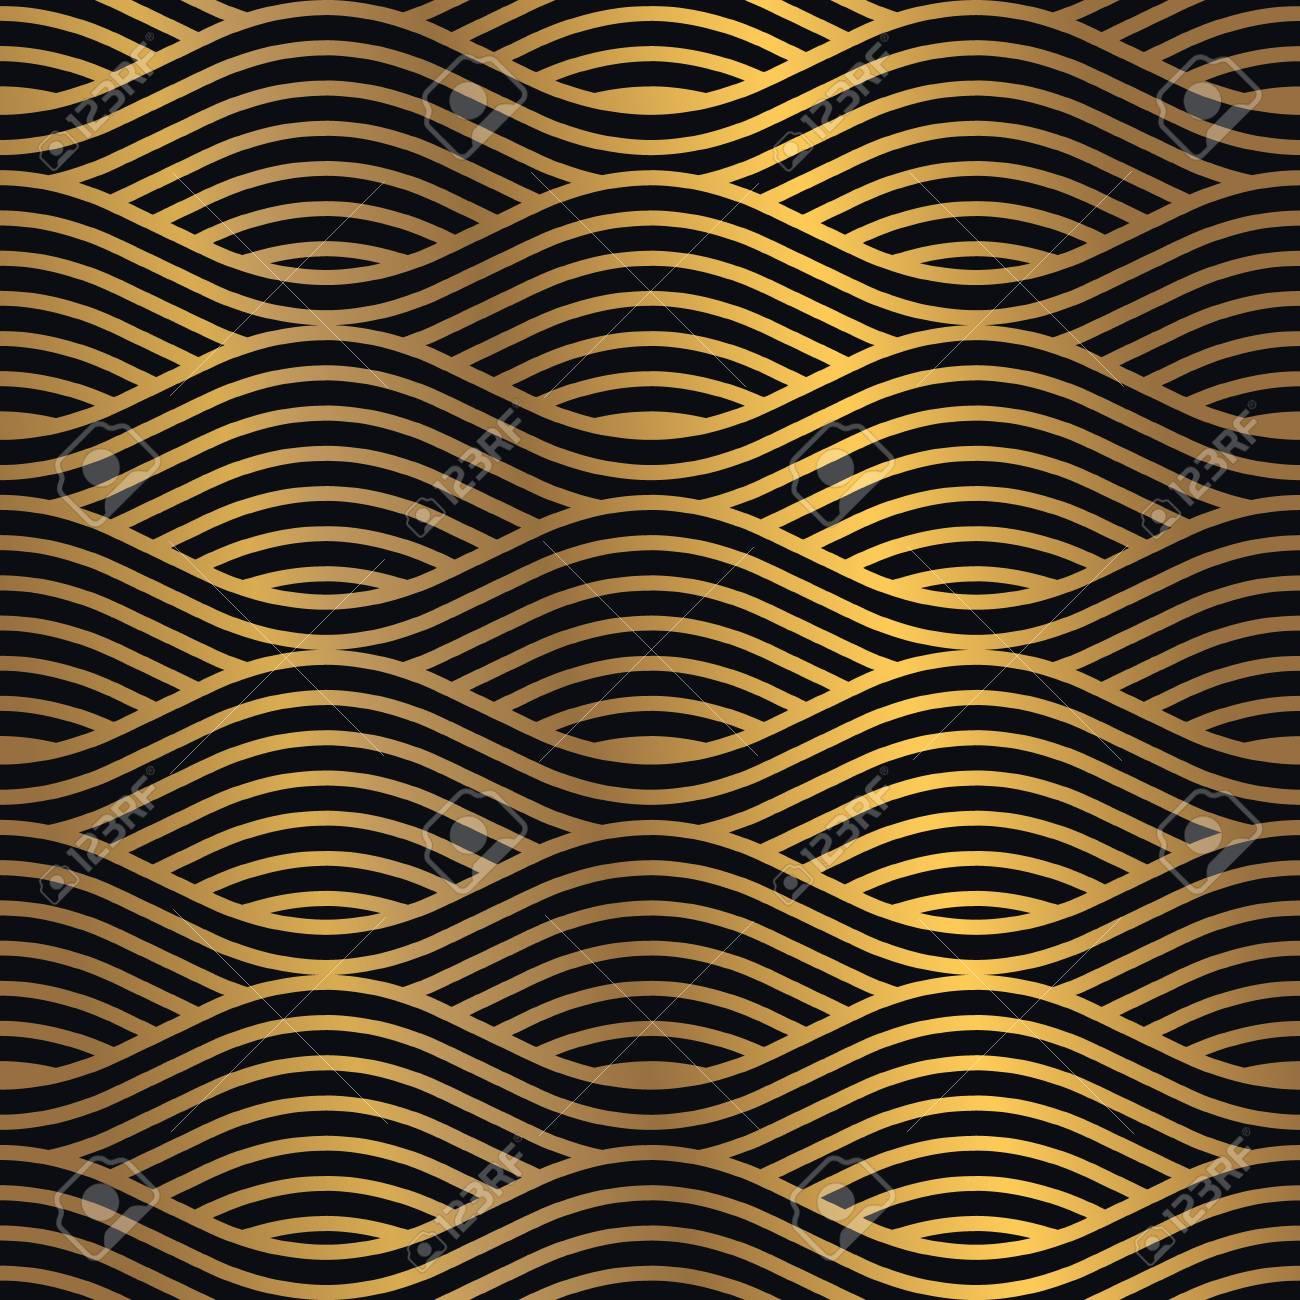 Golden seamless pattern on a dark background. Minimal design pattern combined with flashy golden gradient. Vector graphic design element. - 103816593